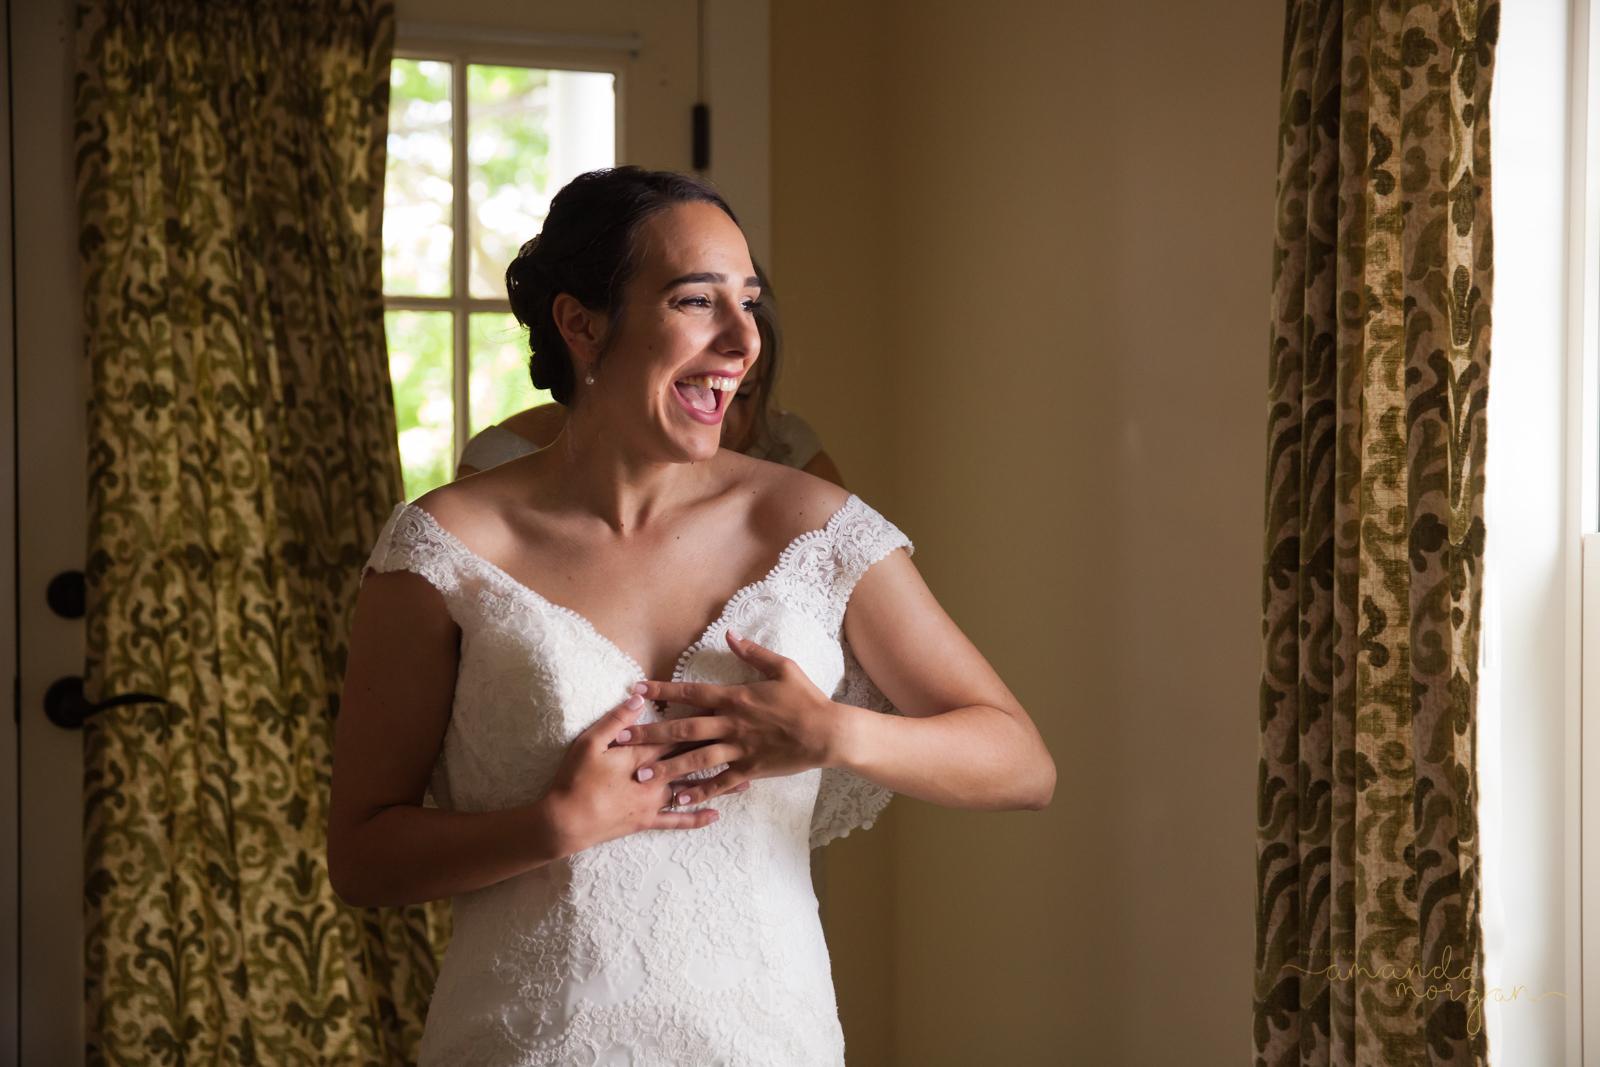 Publick-House-Wedding-Amanda-Morgan-9.jpg